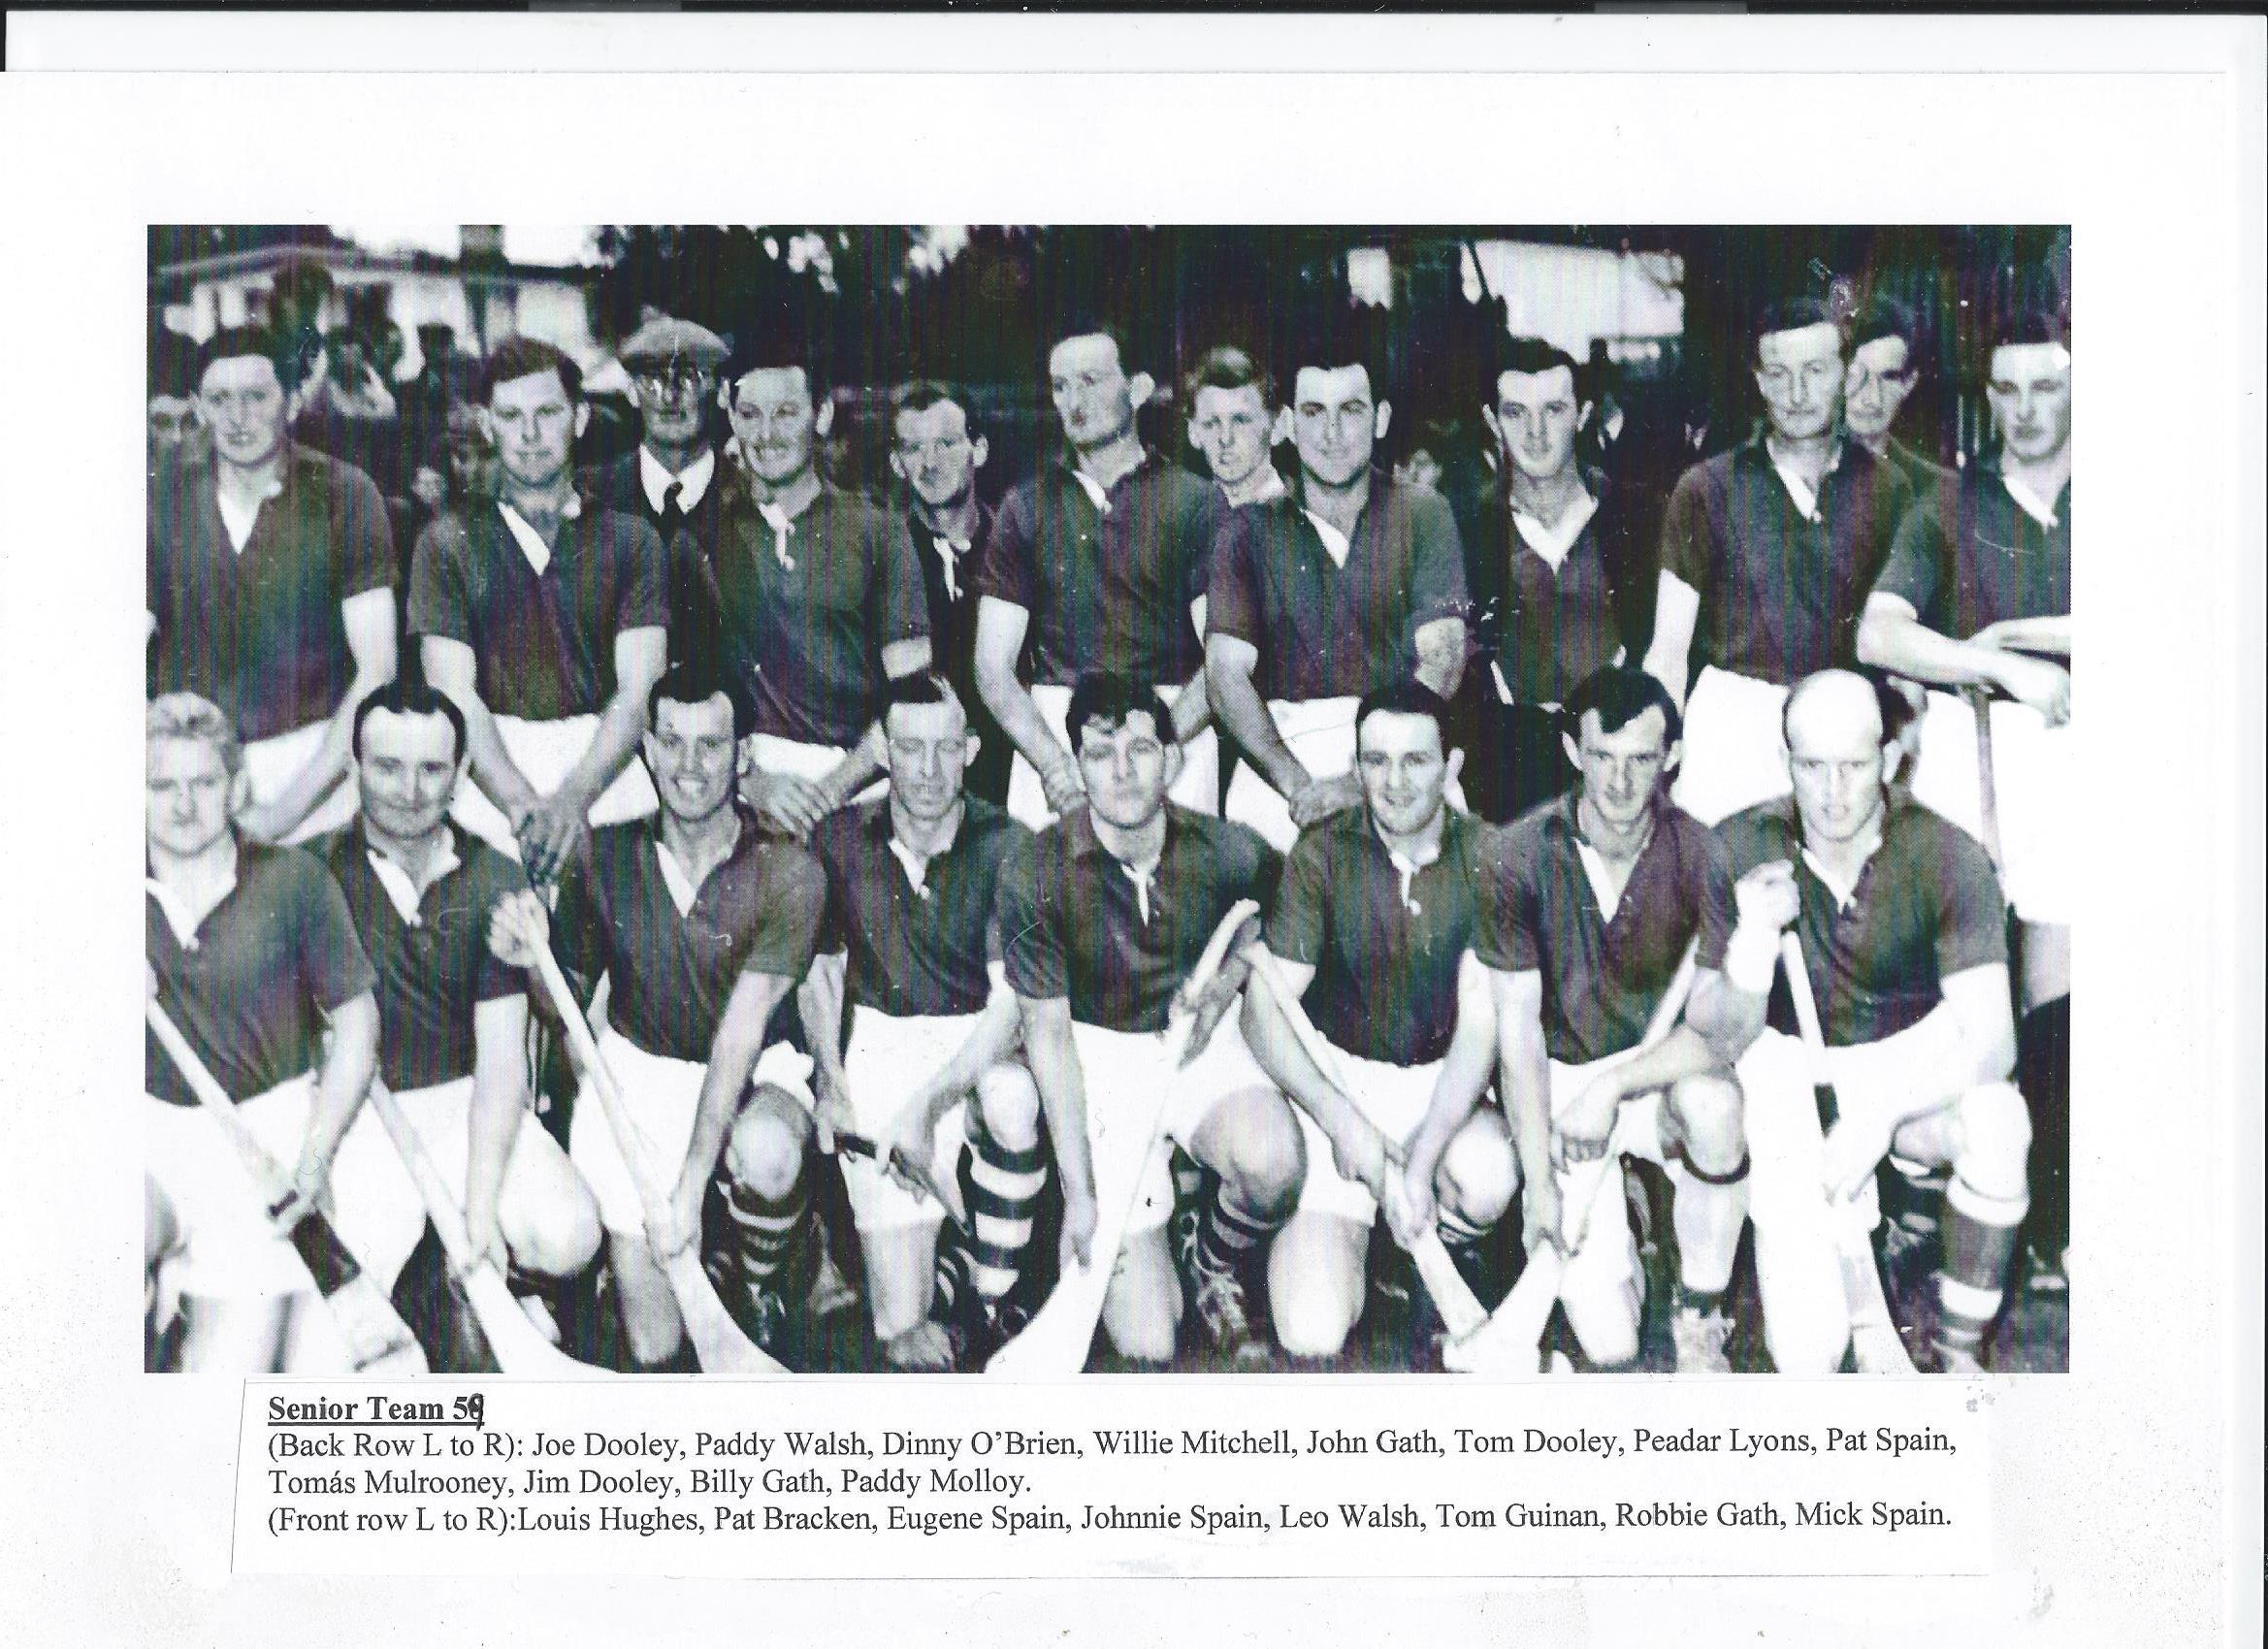 Drumcullen Senior Team - 1959